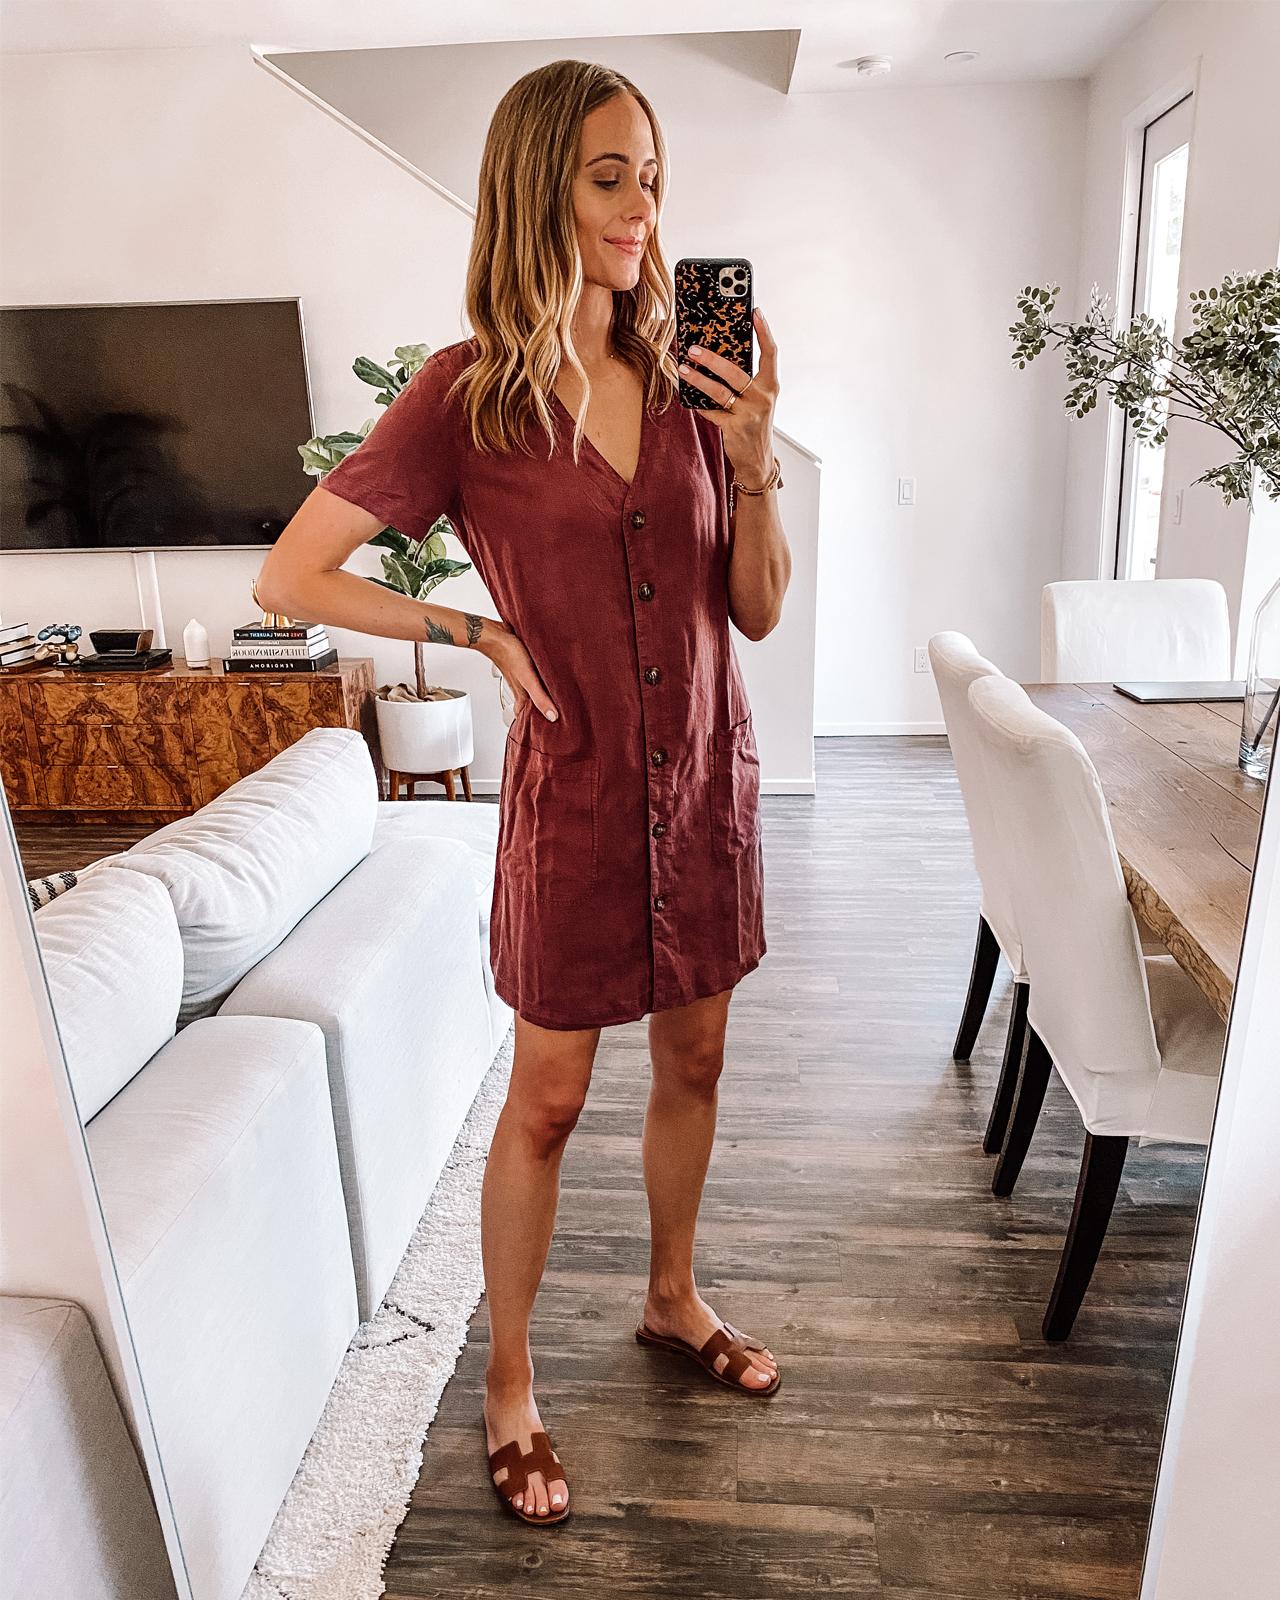 Fashion Jackson Wearing Lou & Grey Red Linen Dress Tan Sandals